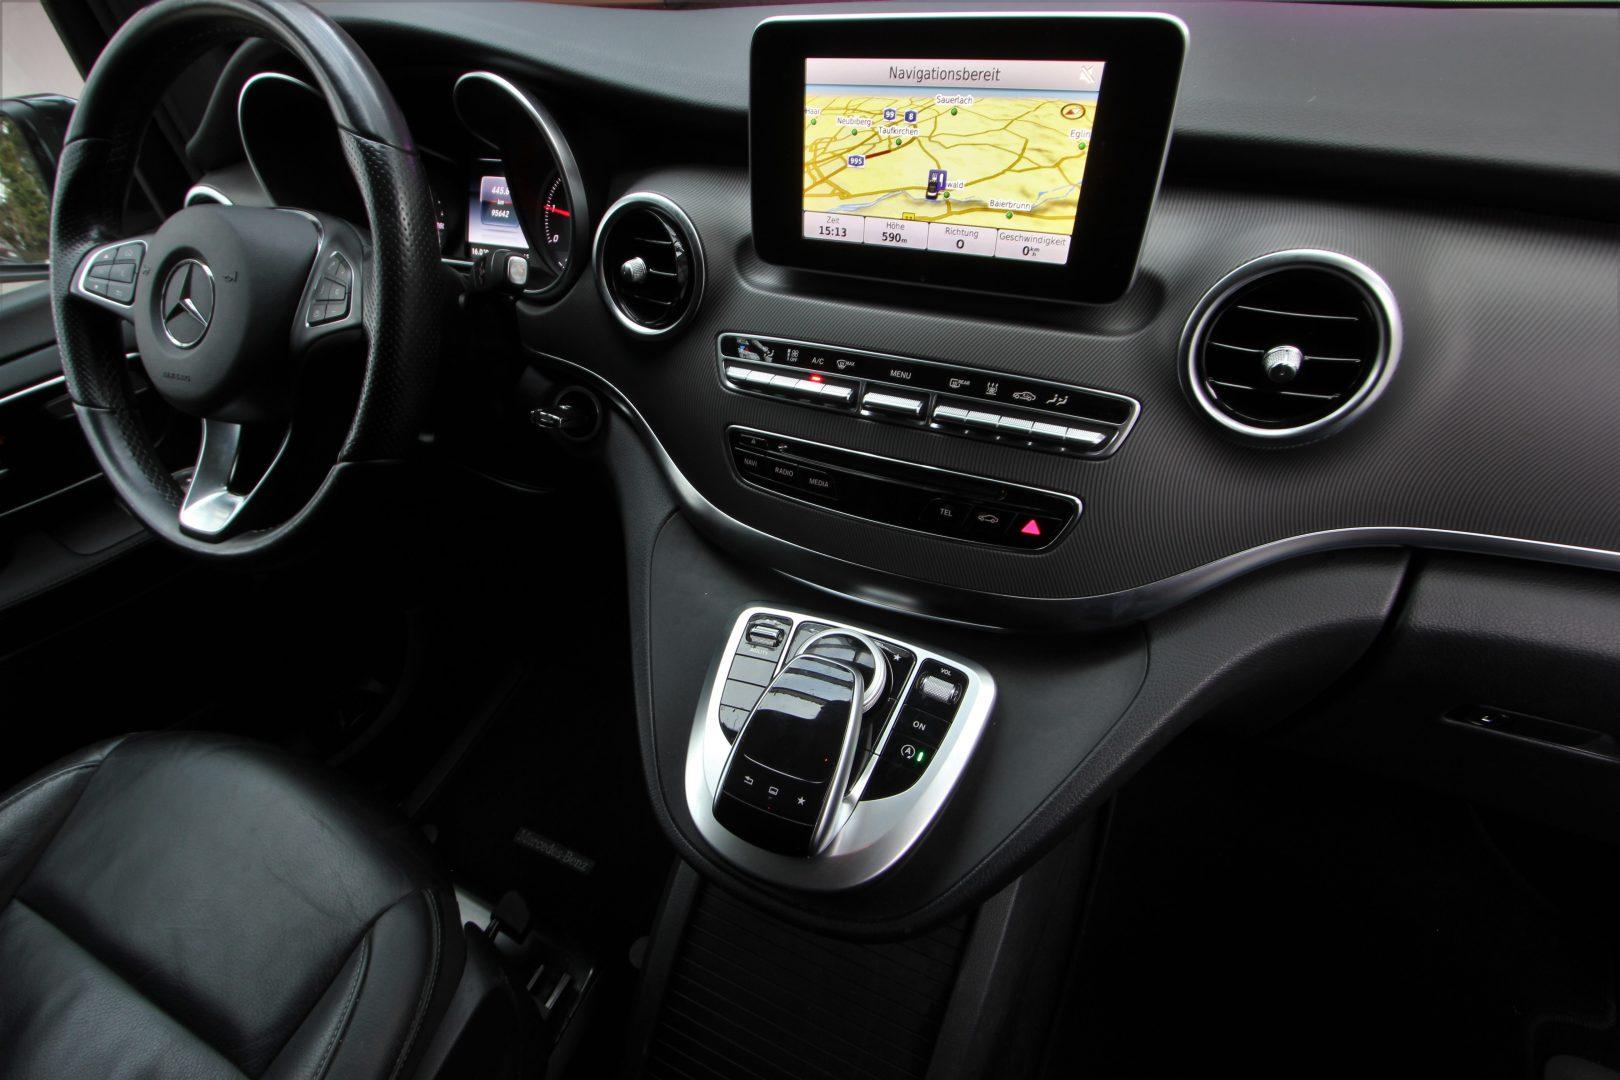 AIL Mercedes-Benz V 250 CDI/BT/d AVANTGARD LED  5